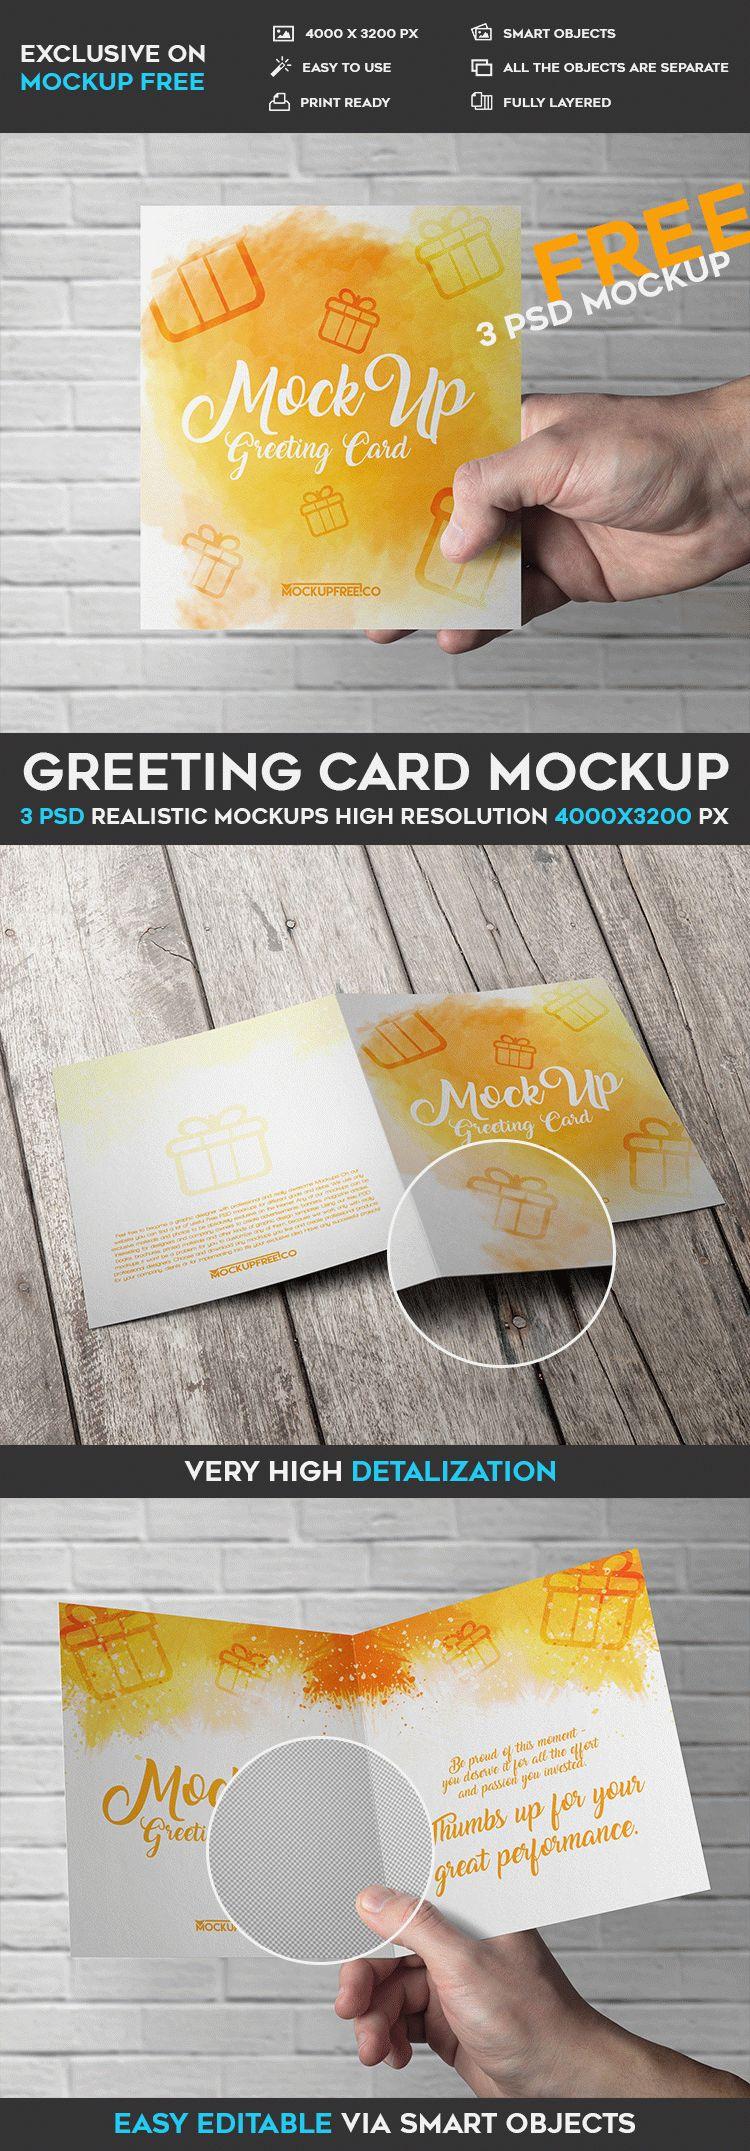 Greeting Card - 3 Free PSD Mockups